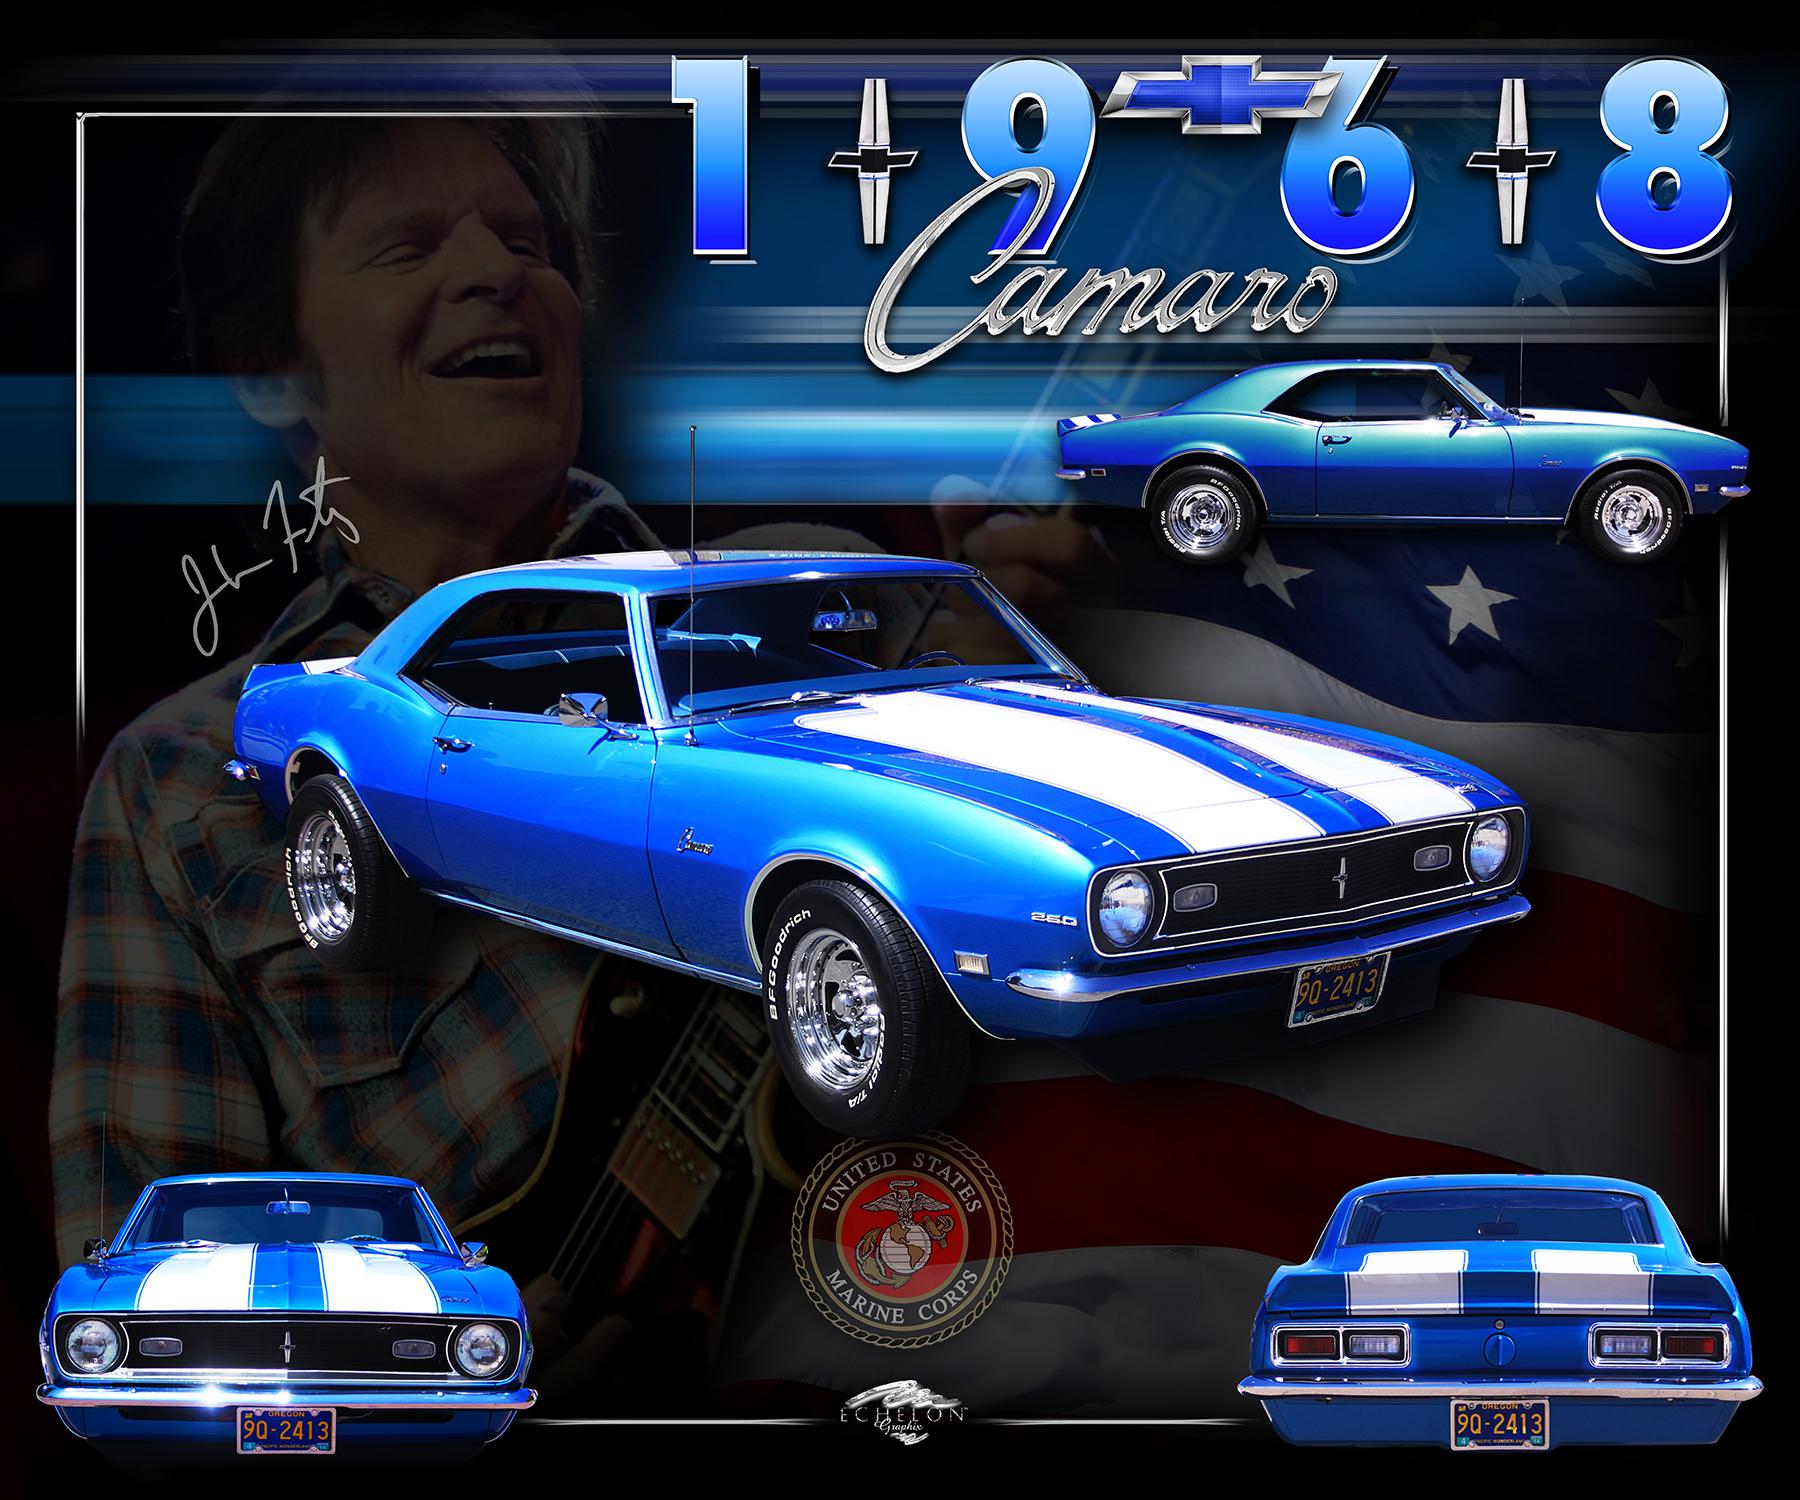 1968 Camaro w/ John Fogerty theme